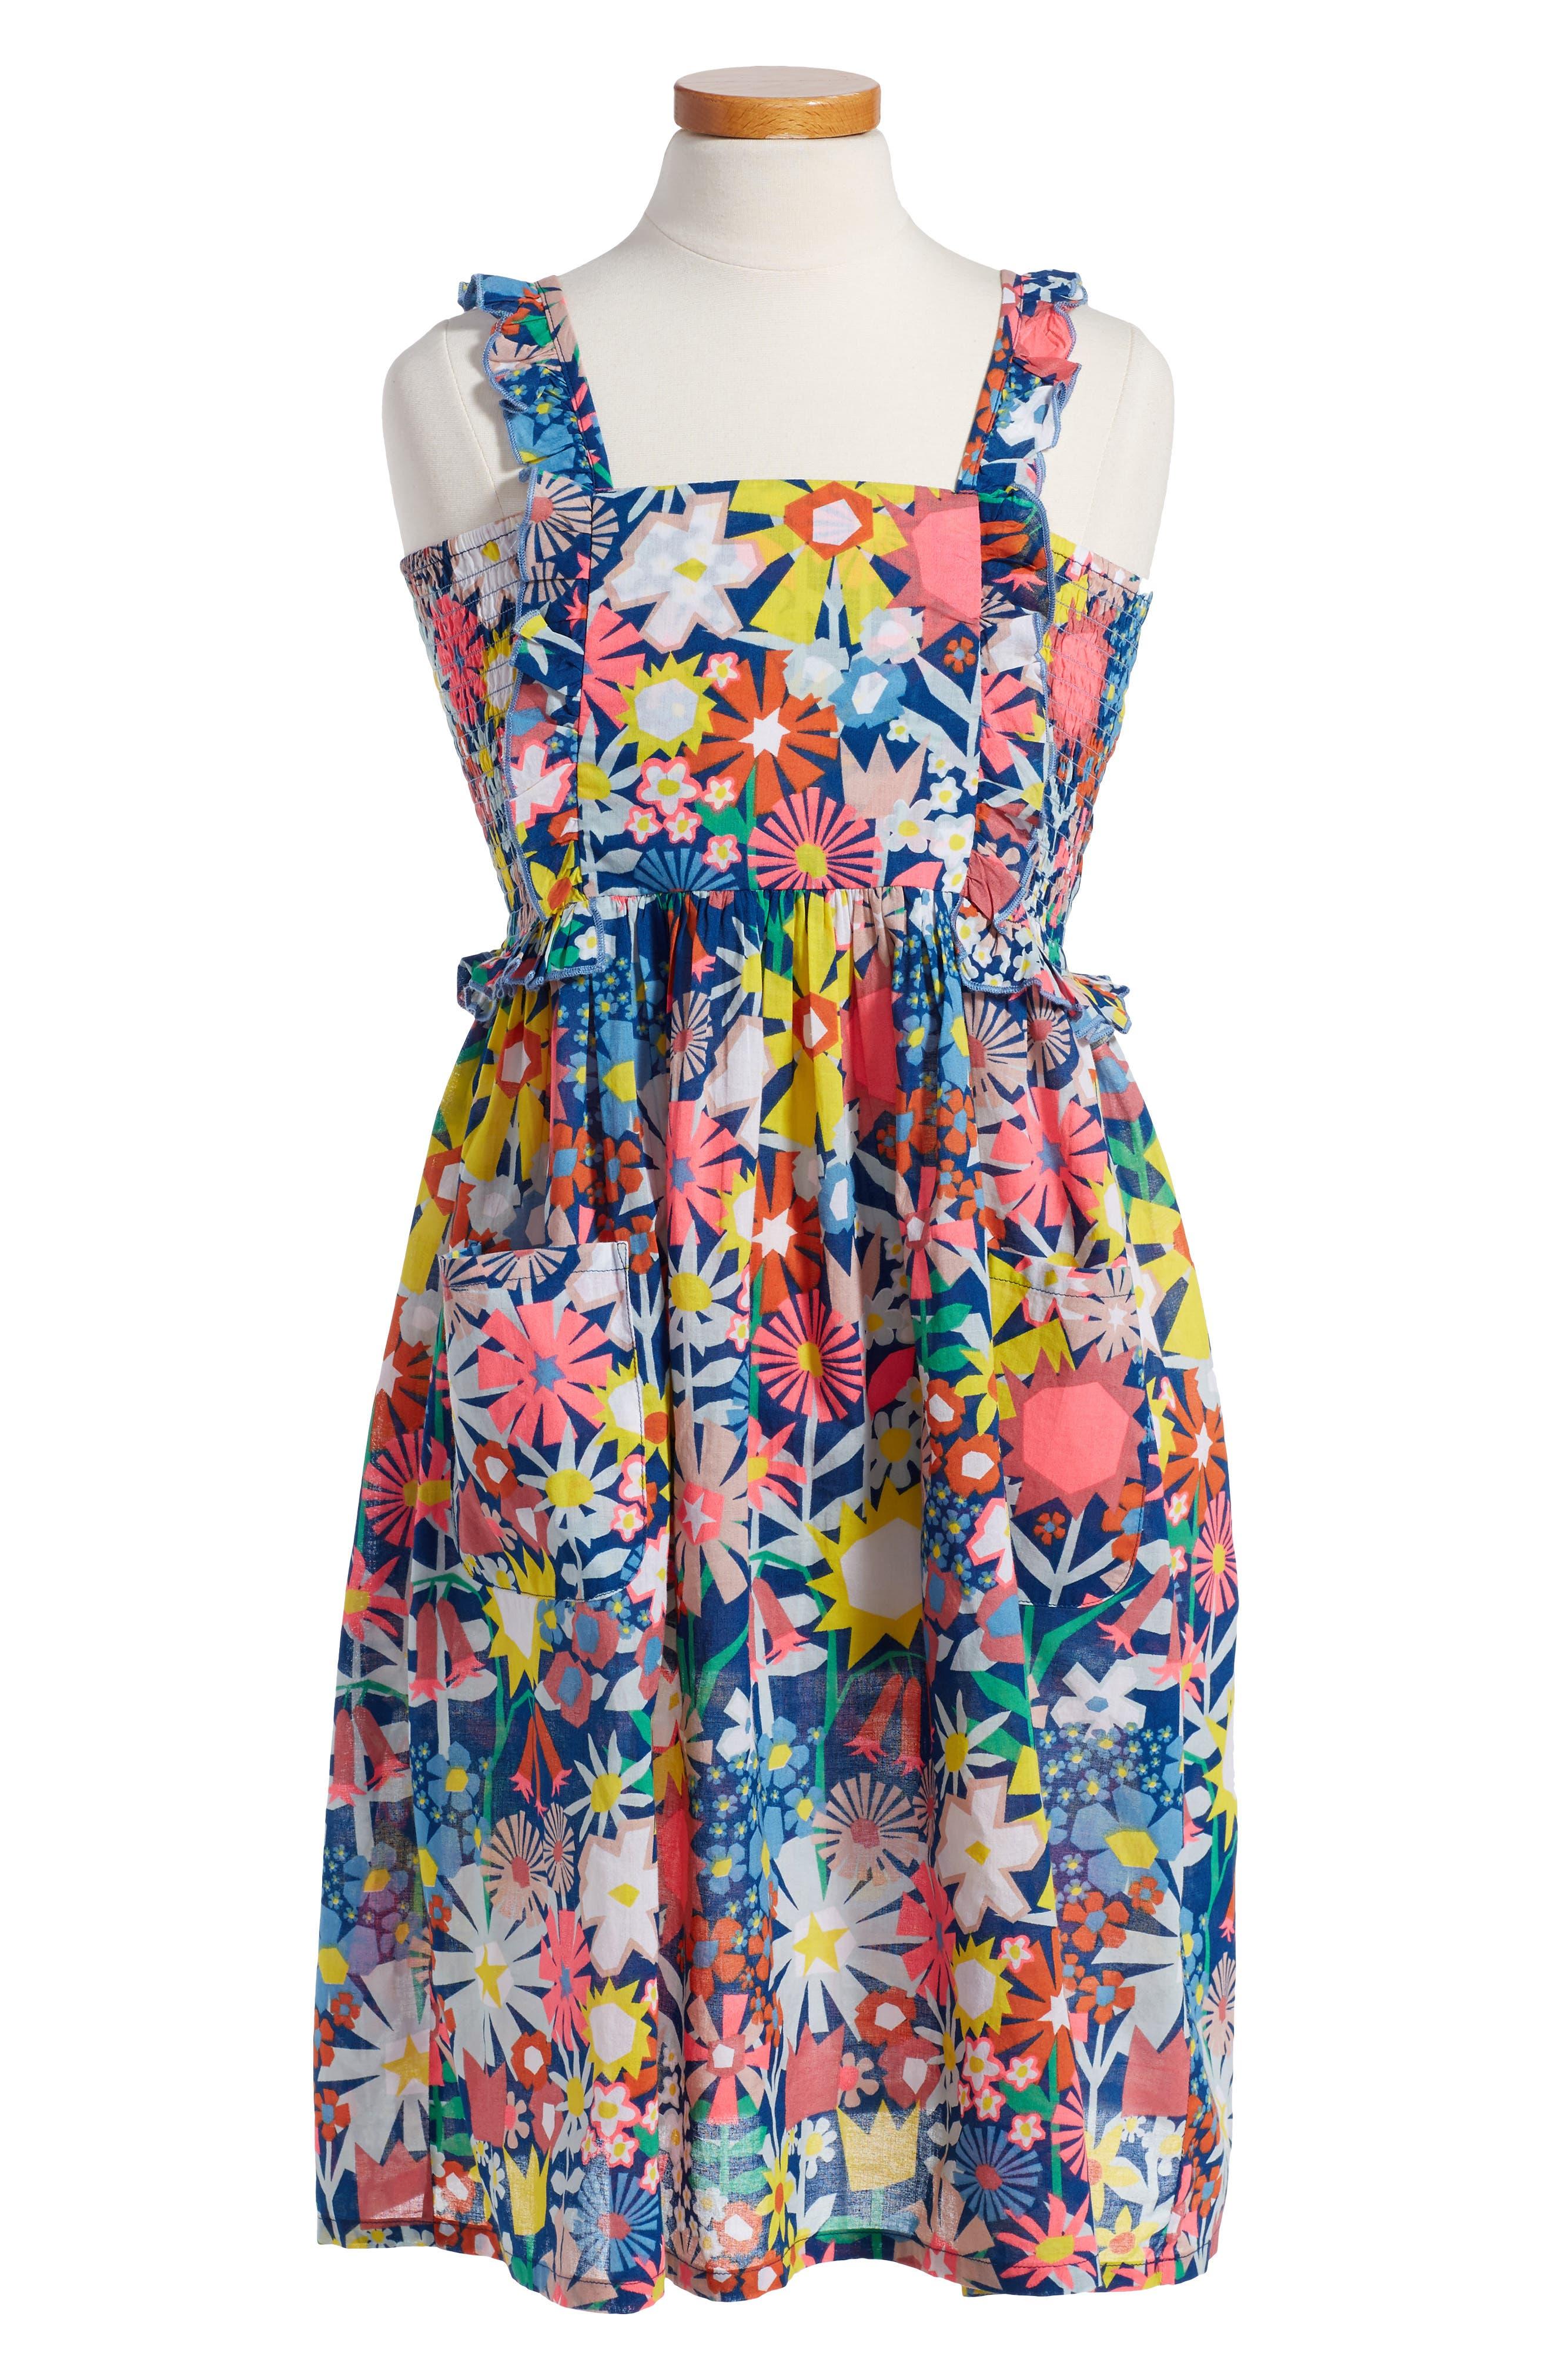 Stella McCartney Kids Celeste Floral Print Dress (Toddler Girls, Little Girls & Big Girls)